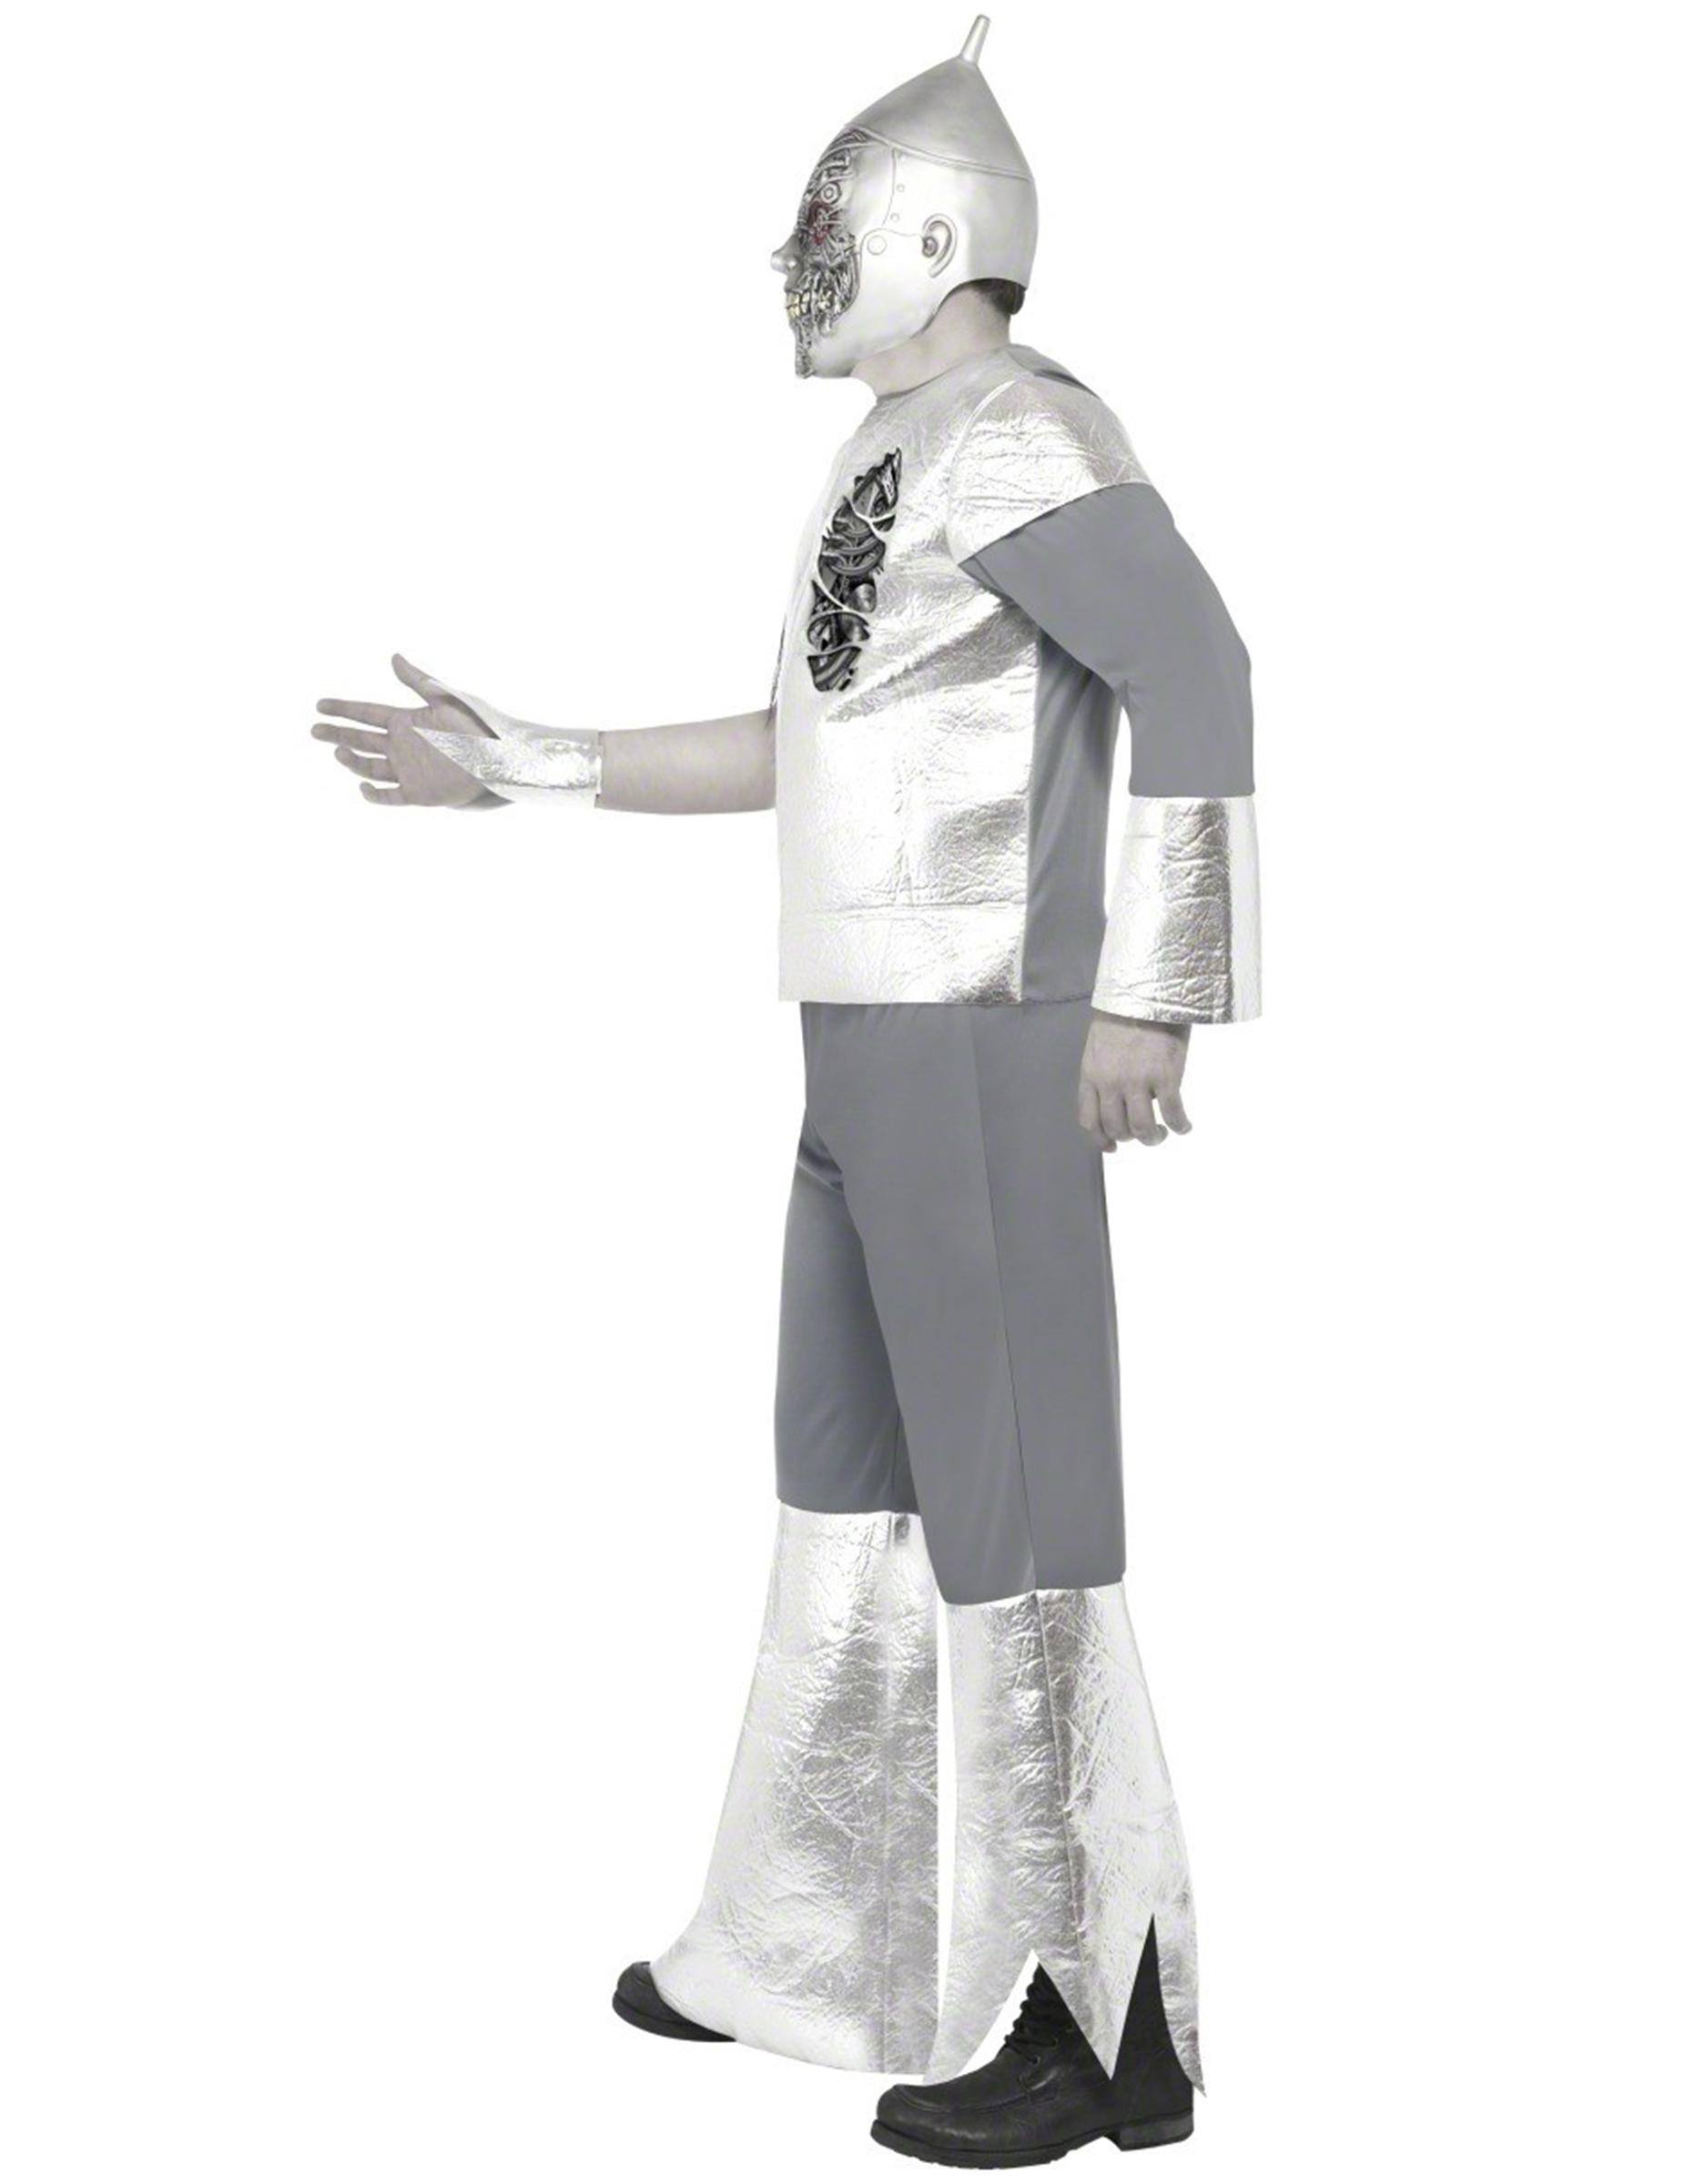 roboter zombi kost m f r erwachsene kost me f r erwachsene und g nstige faschingskost me vegaoo. Black Bedroom Furniture Sets. Home Design Ideas